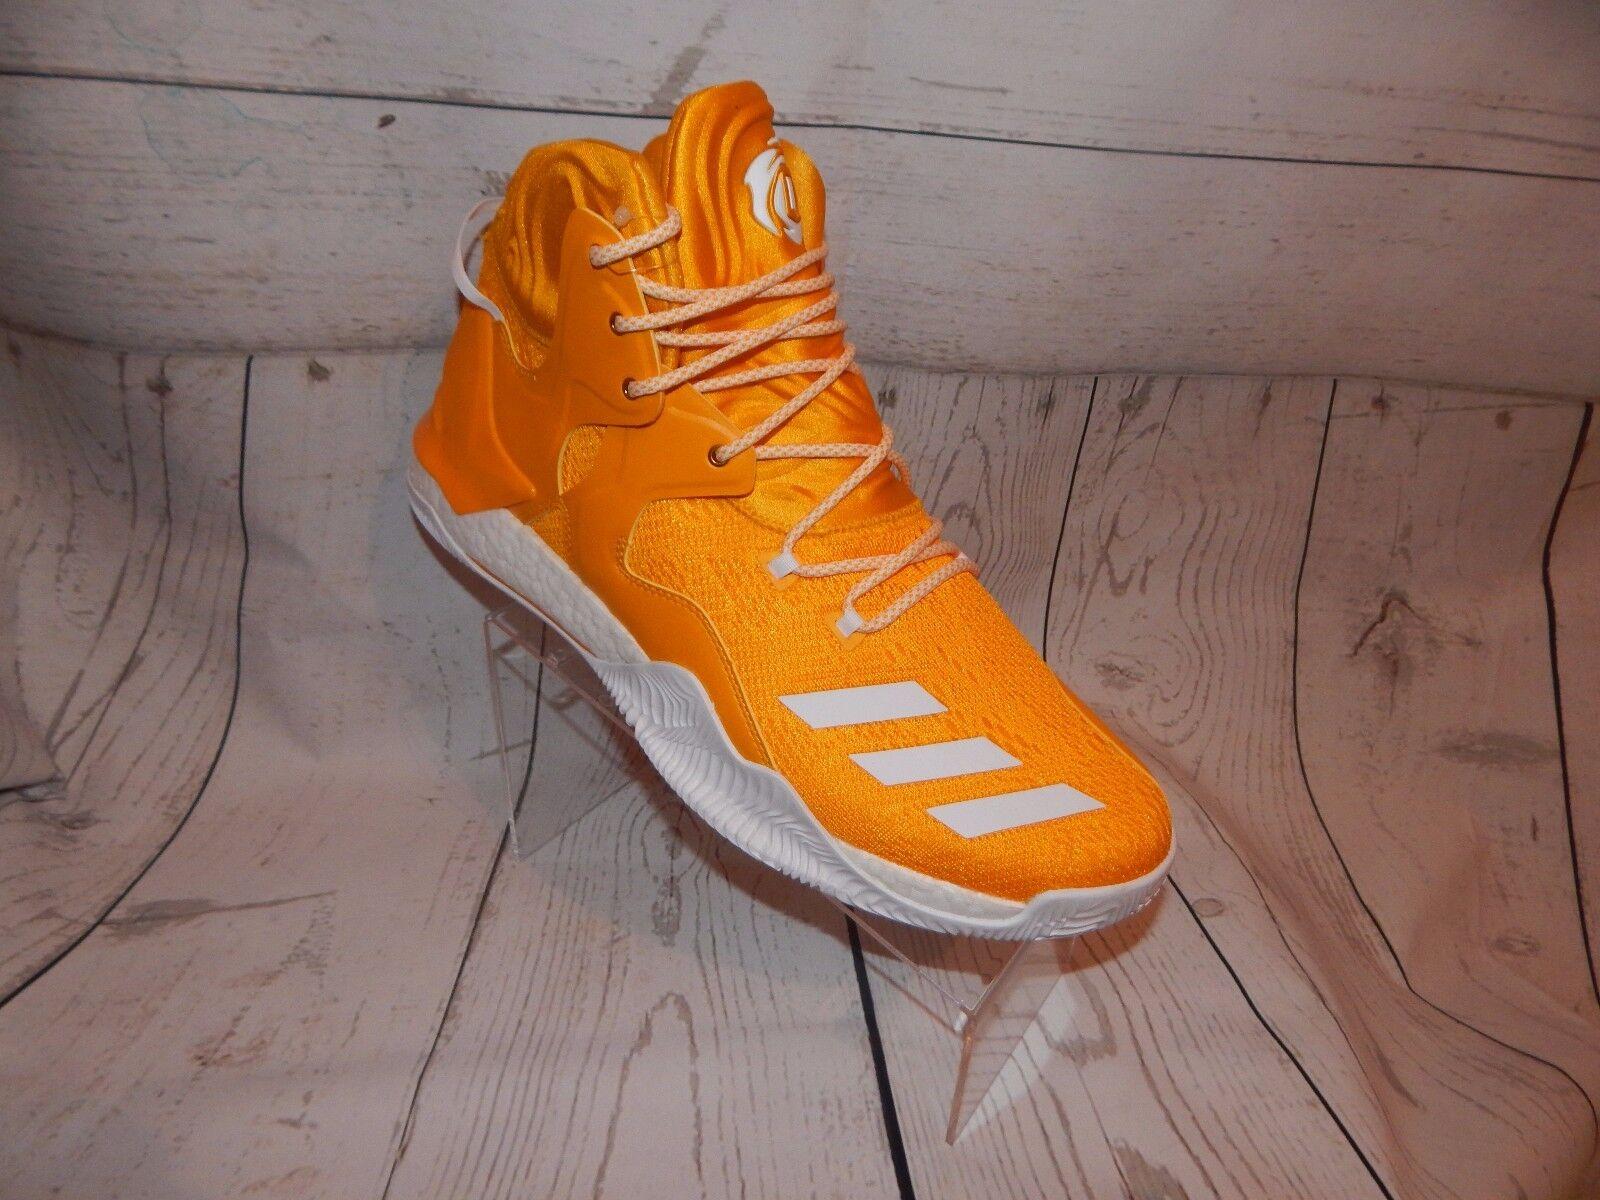 Adidas s rose 7 impulso basket ncaa d'oro giallo b38939 - basket impulso maschile scarpa sz 13,5 80df75